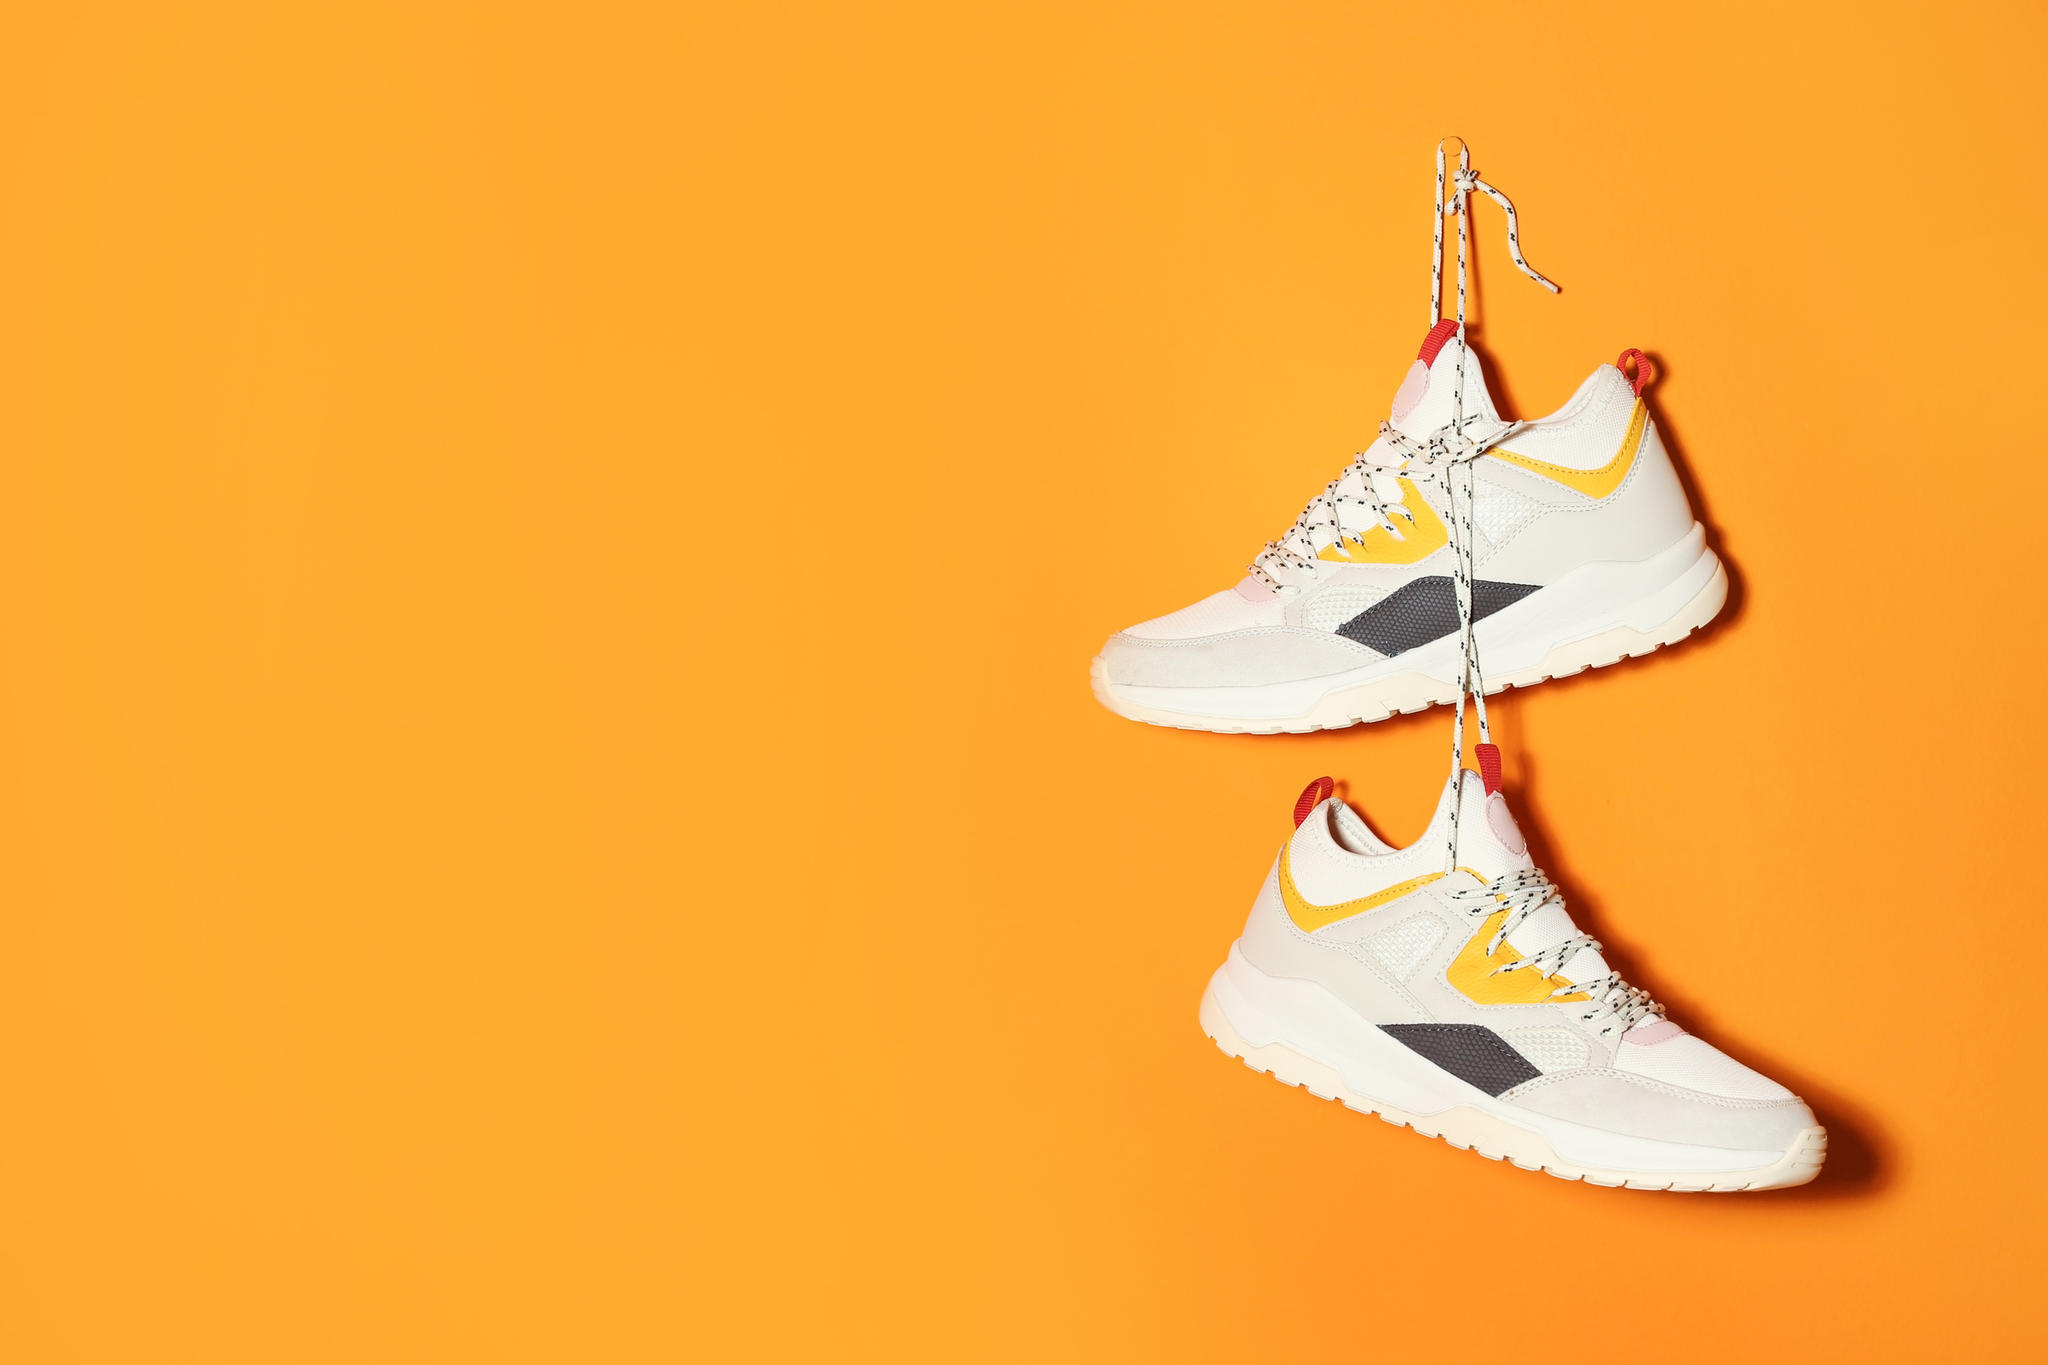 4f2baa55d319 Schuhe: Wie ihr Sneakers kombinieren könnt | BRIGITTE.de